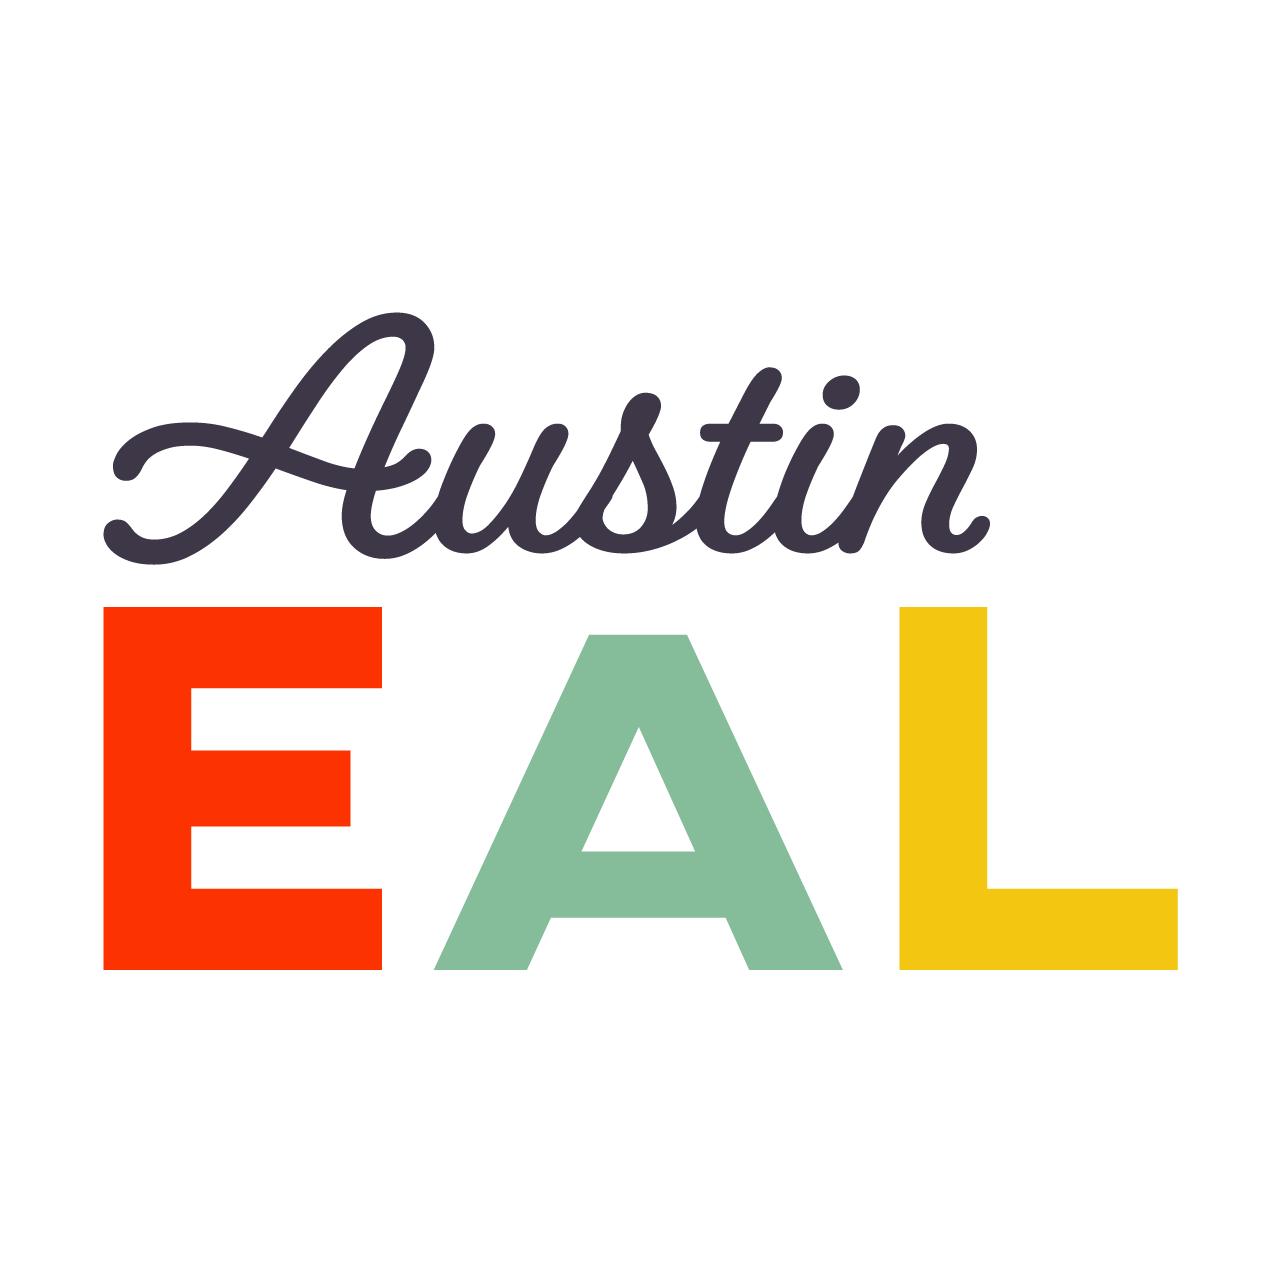 Austin Emerging Arts Leaders